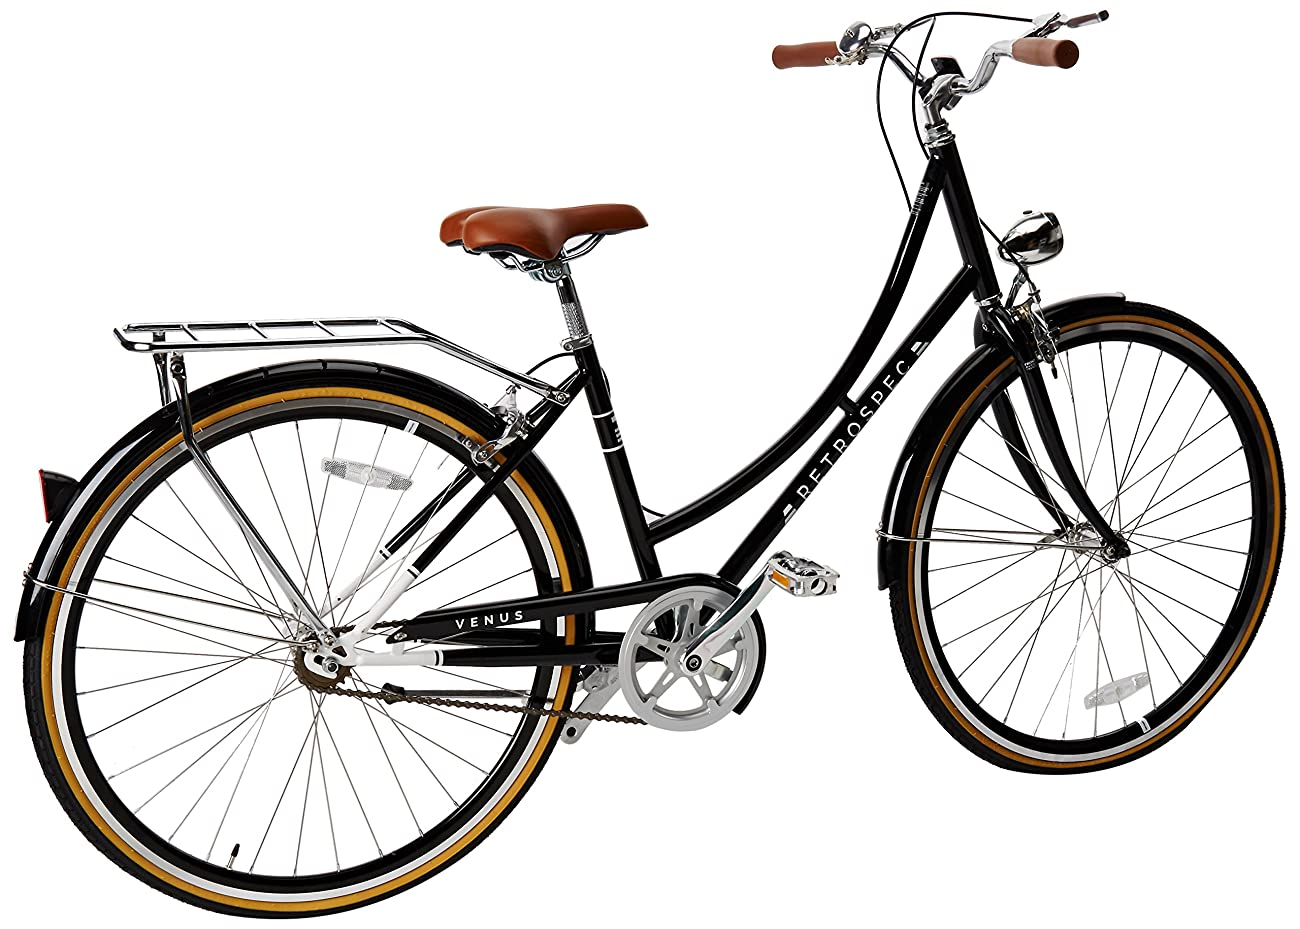 Retrospec Venus Dutch Step-Thru City Comfort Hybrid Bike 1